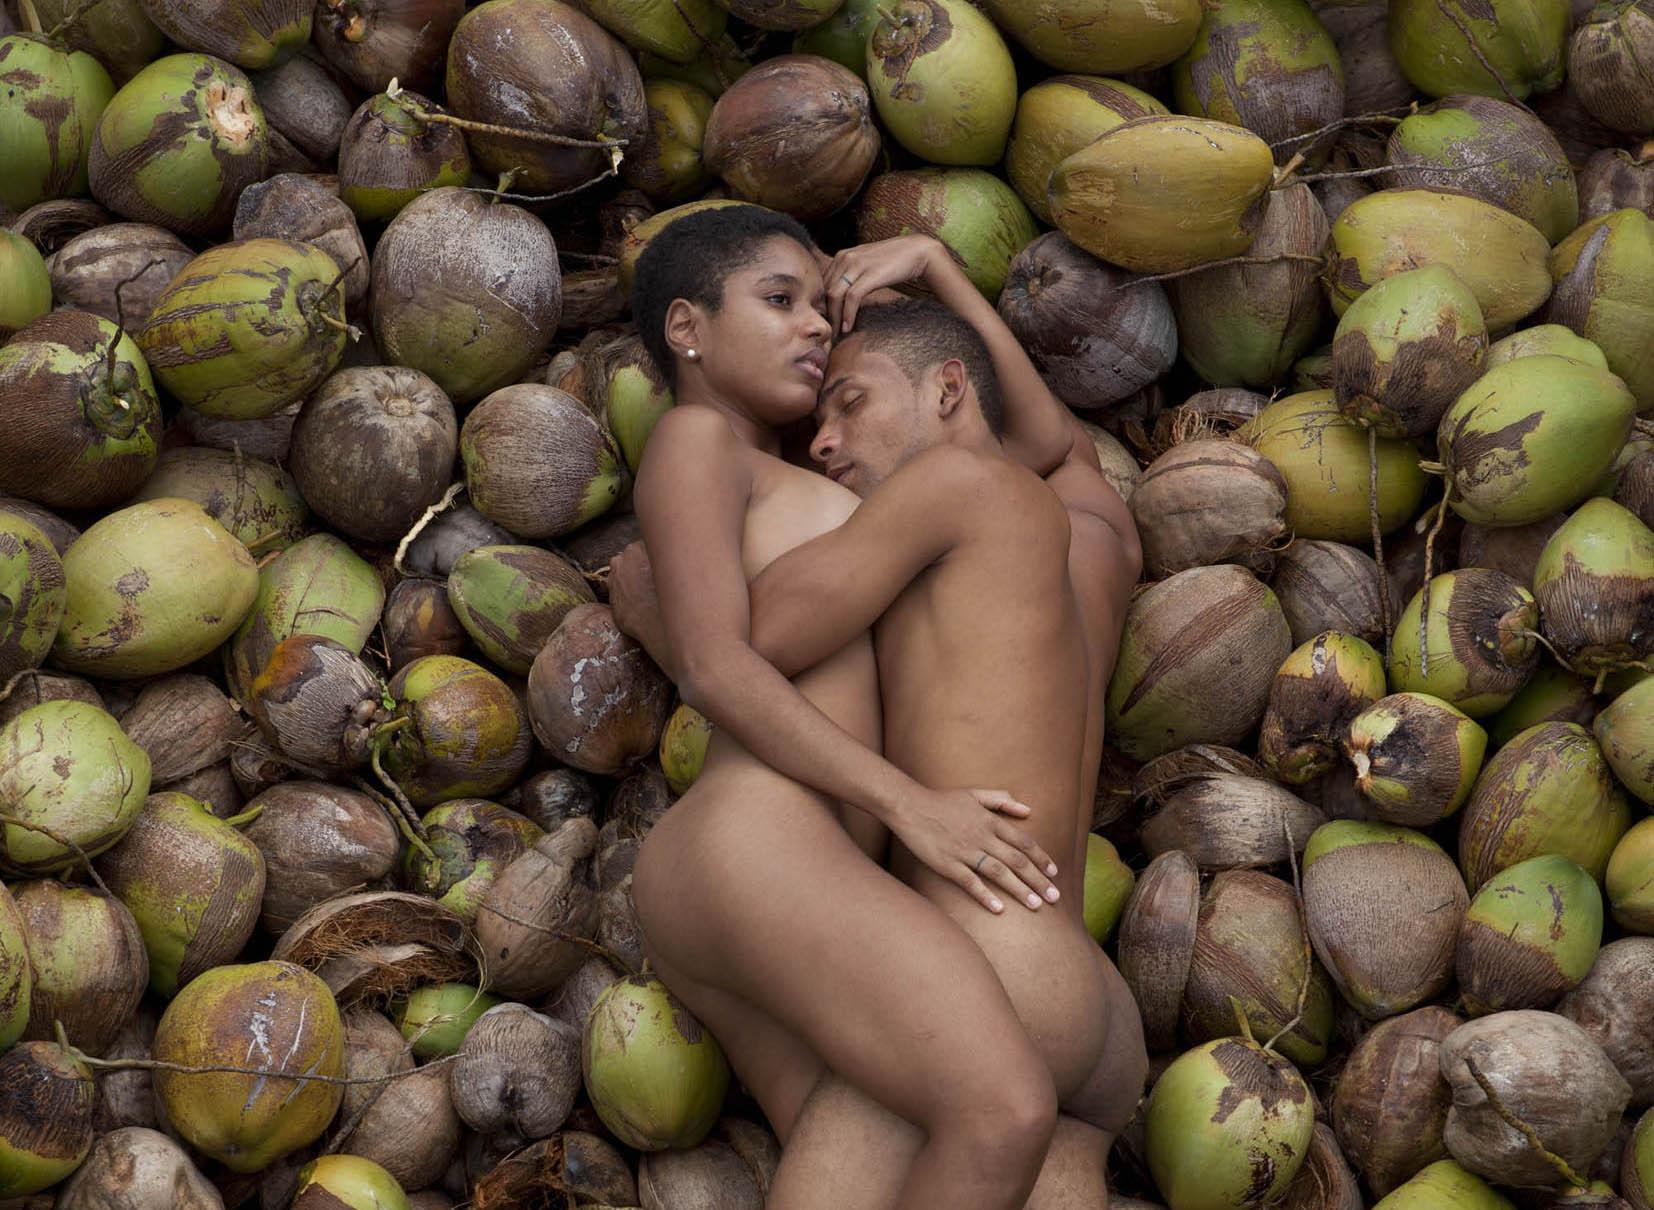 Netflixeando: 15 Brazilian Movies You Should Stream on Netflix